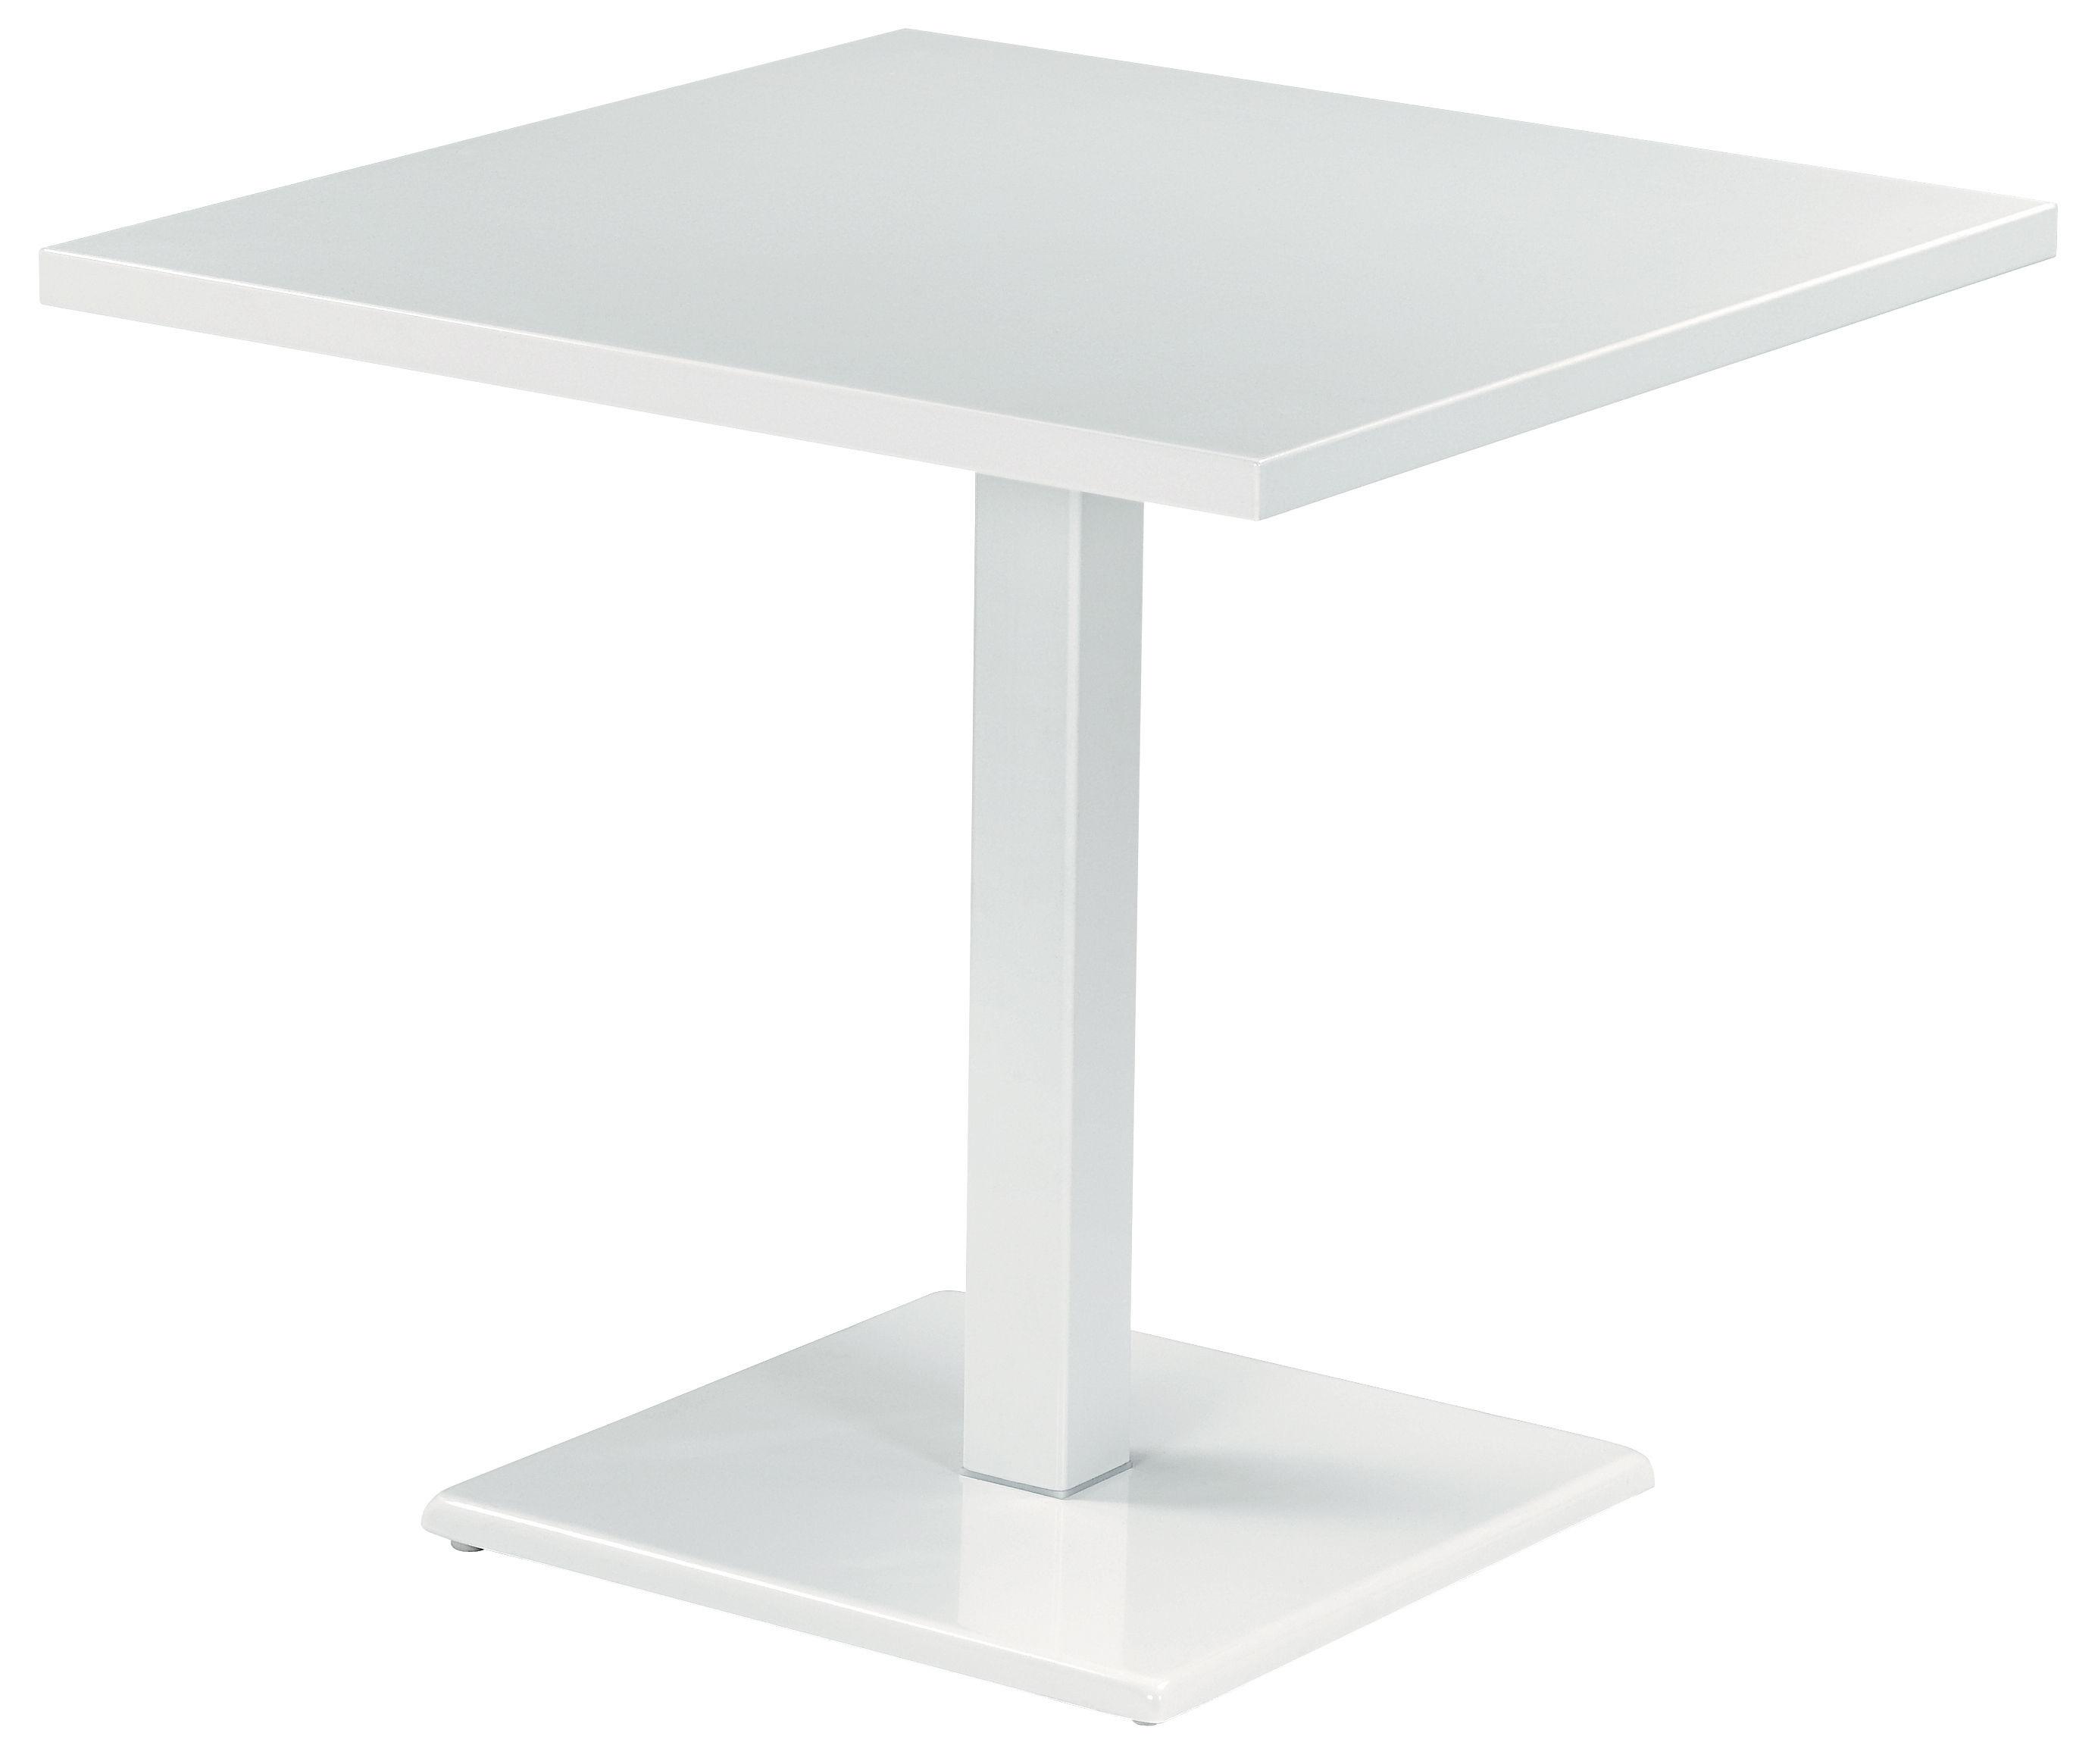 Tavolo da giardino round emu bianco h 75 made in design - Emu tavoli da giardino ...